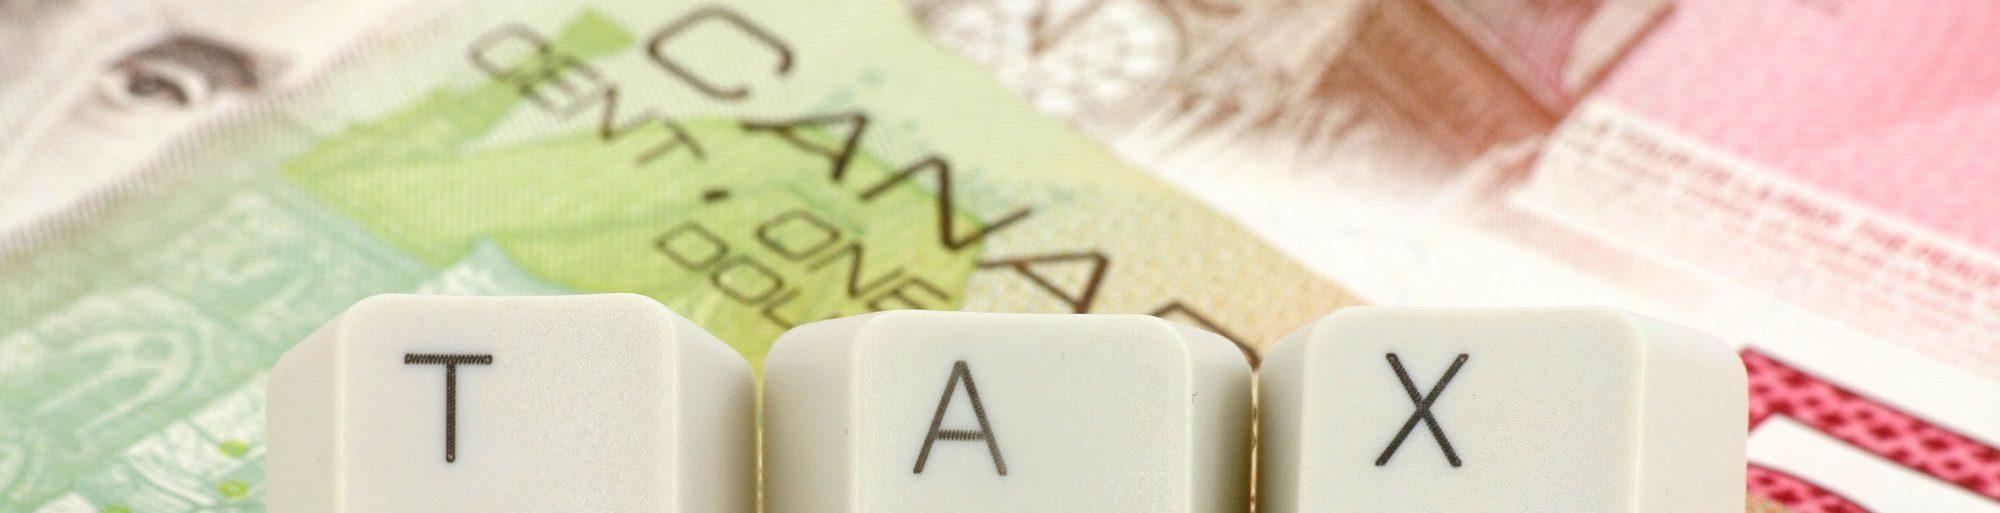 Corporate Tax Planning in Toronto & Hamilton